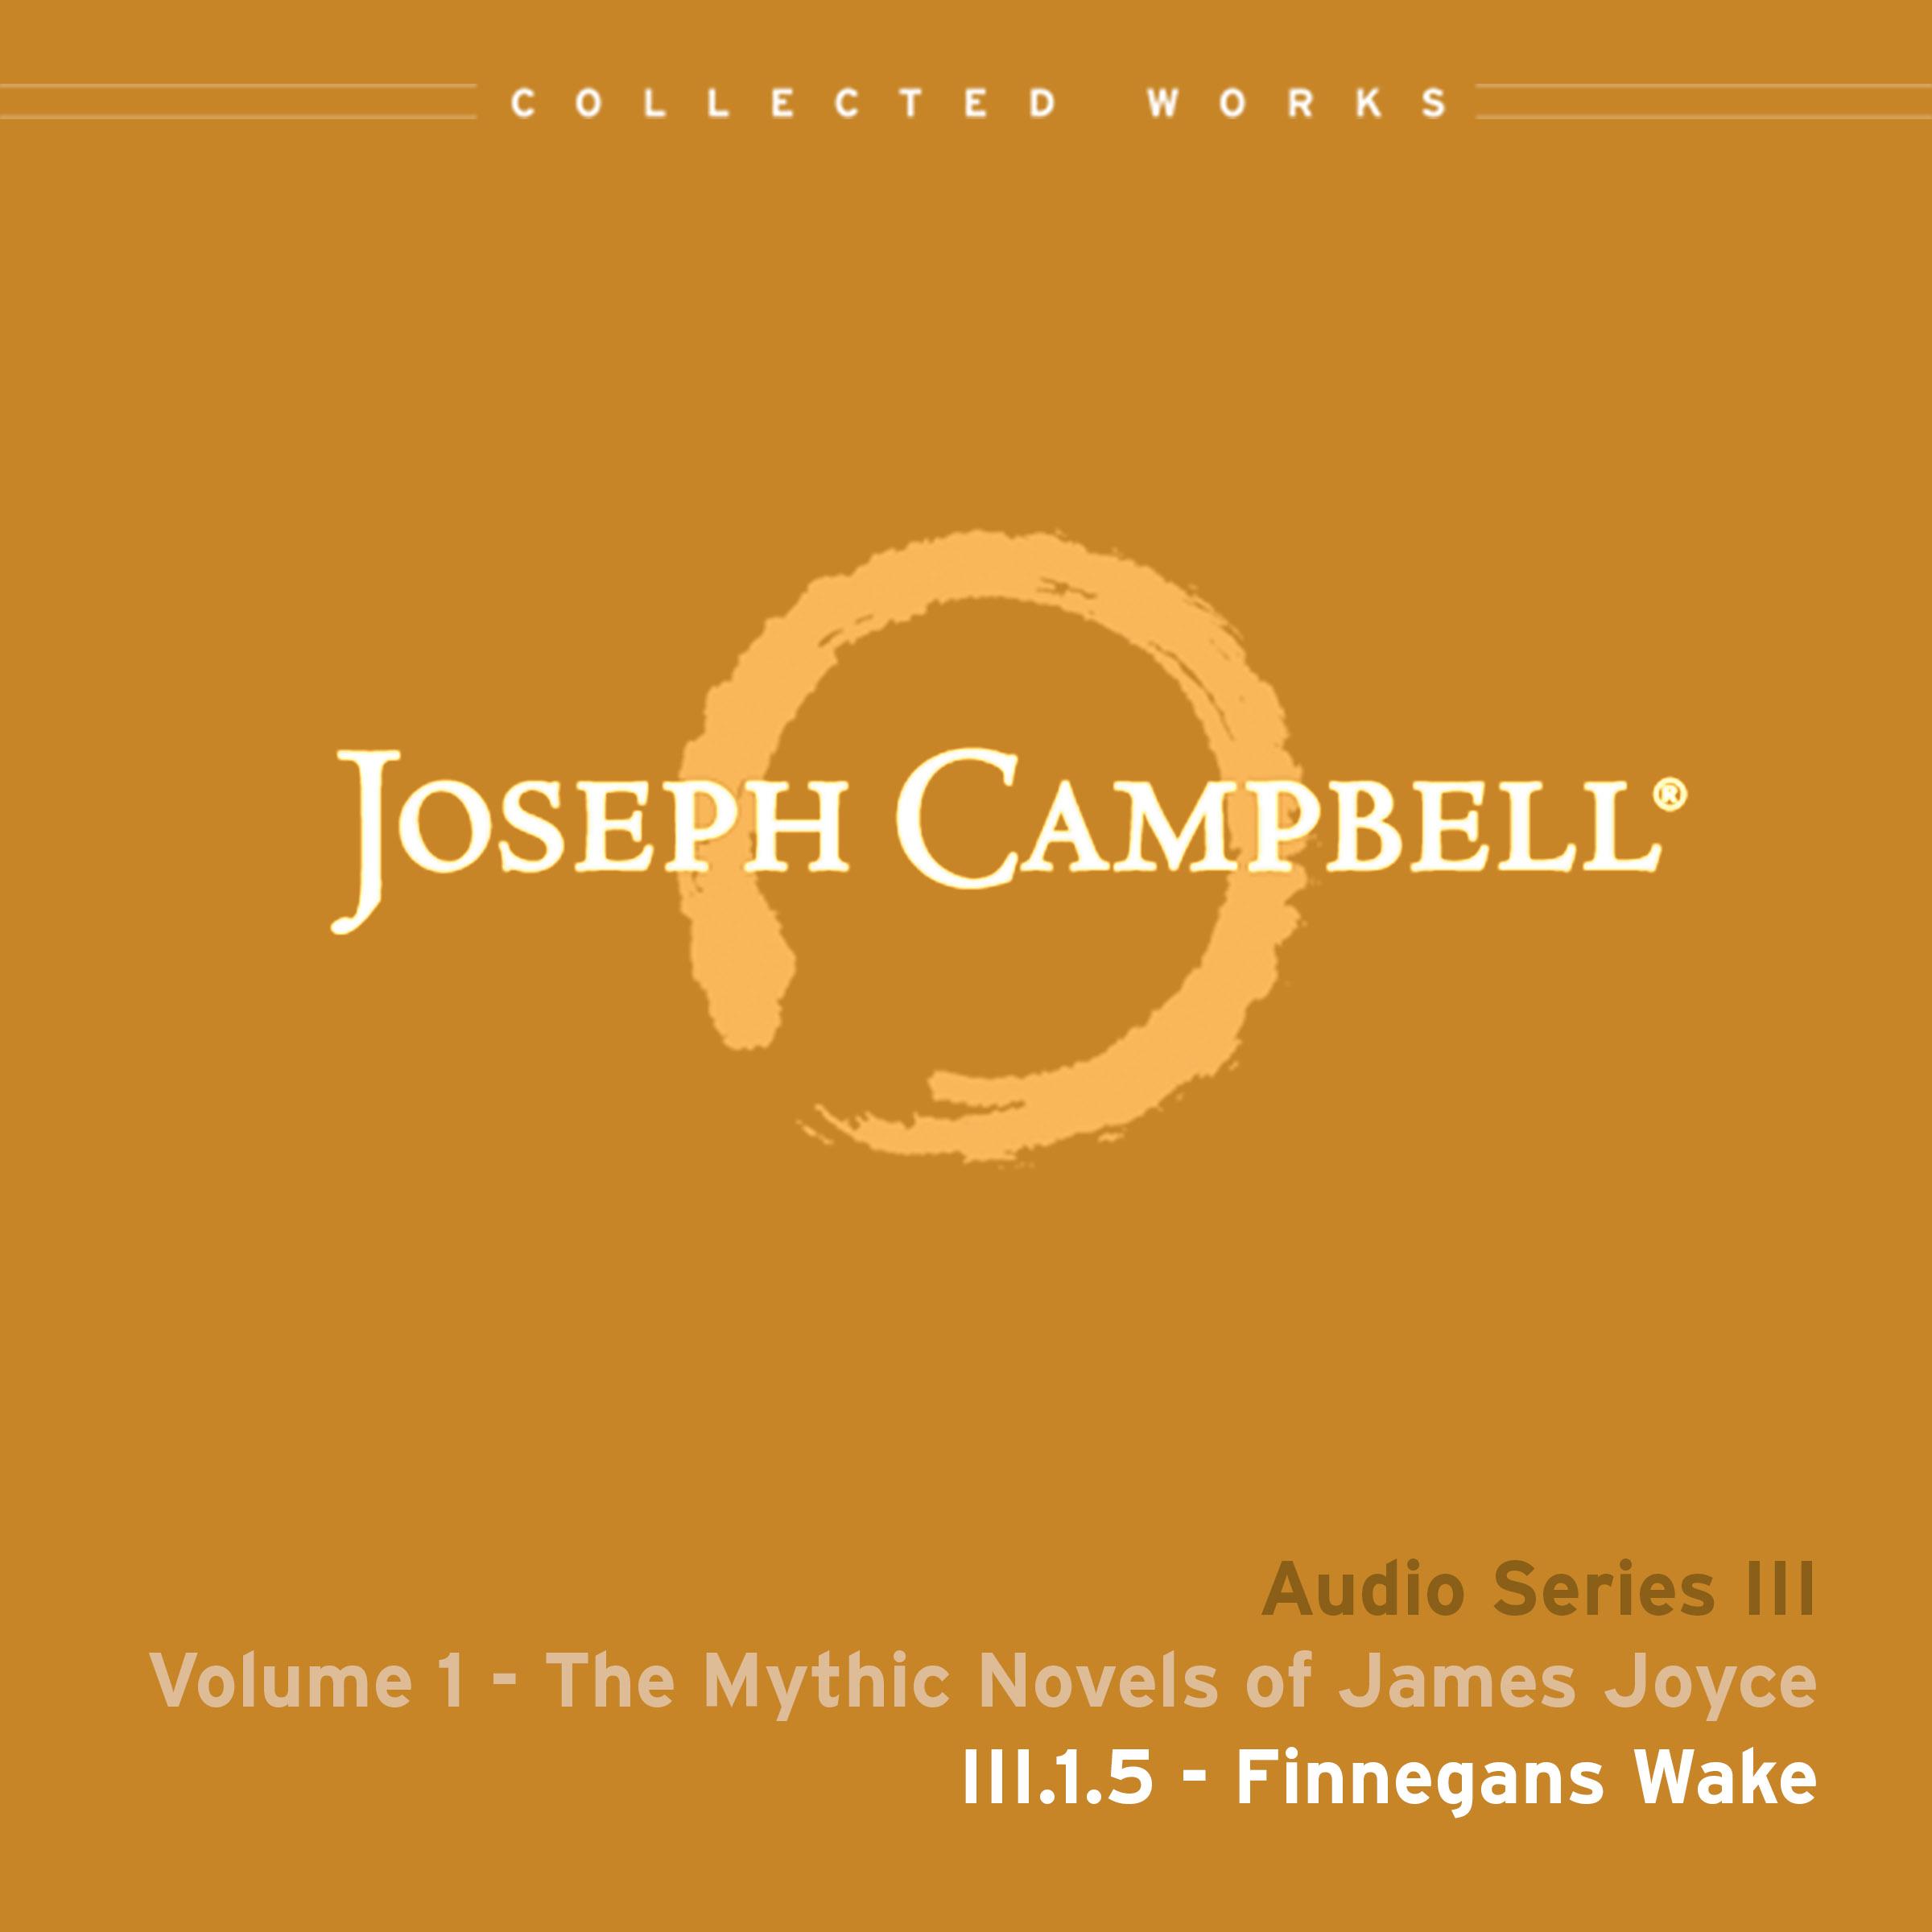 Audio: Lecture III.1.5 - Finnegans Wake